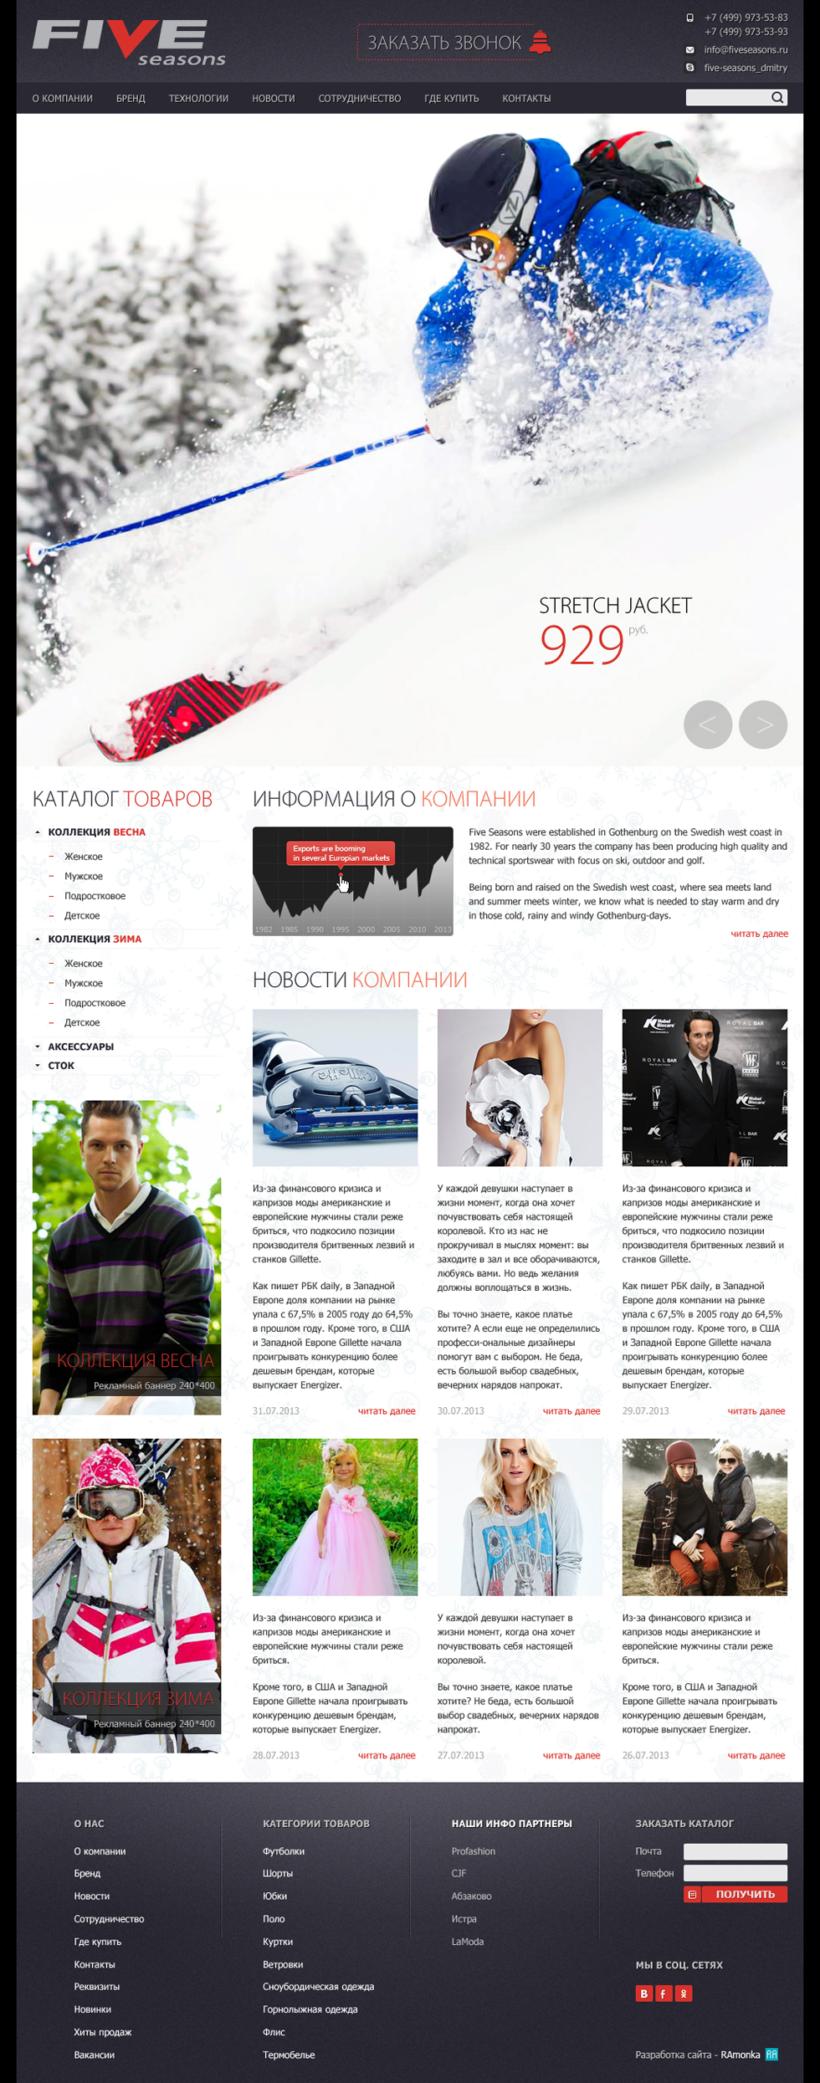 Web Design for Clothing Online Store FIVESEASONS